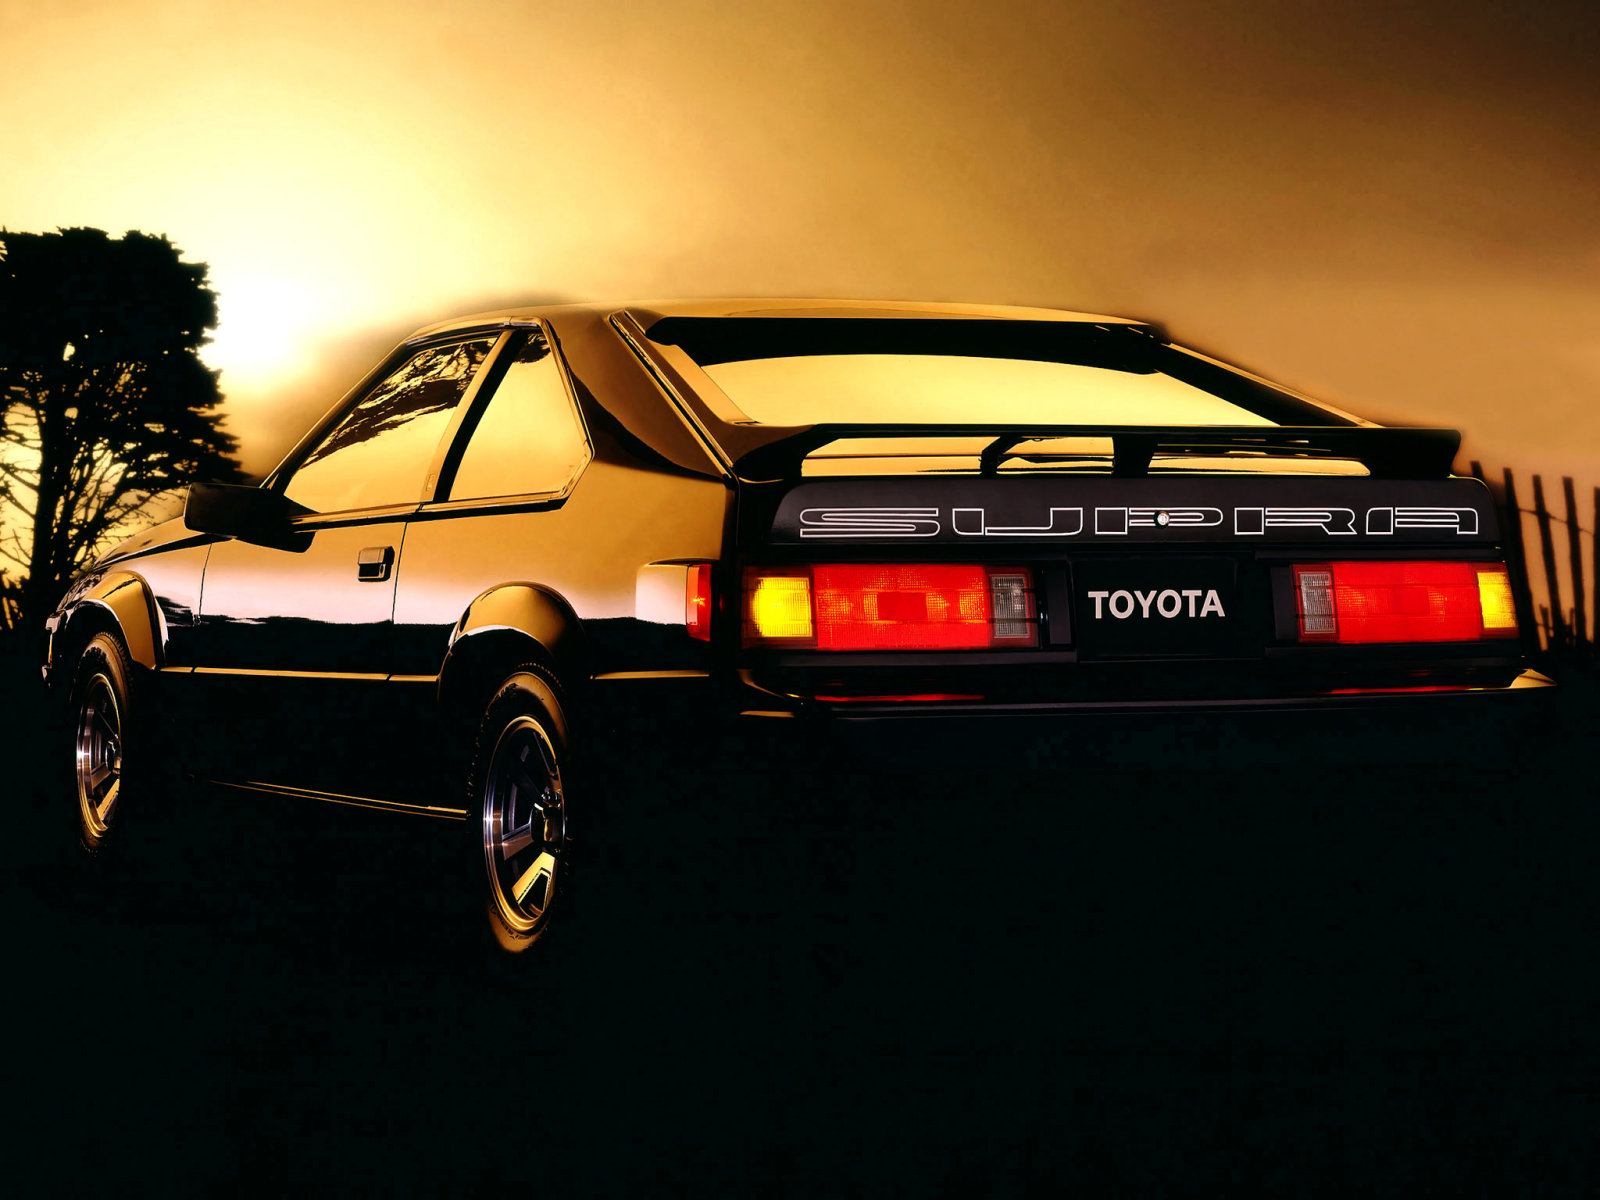 Toyota (Тойота) Celica Liftback 1985-1990 г.